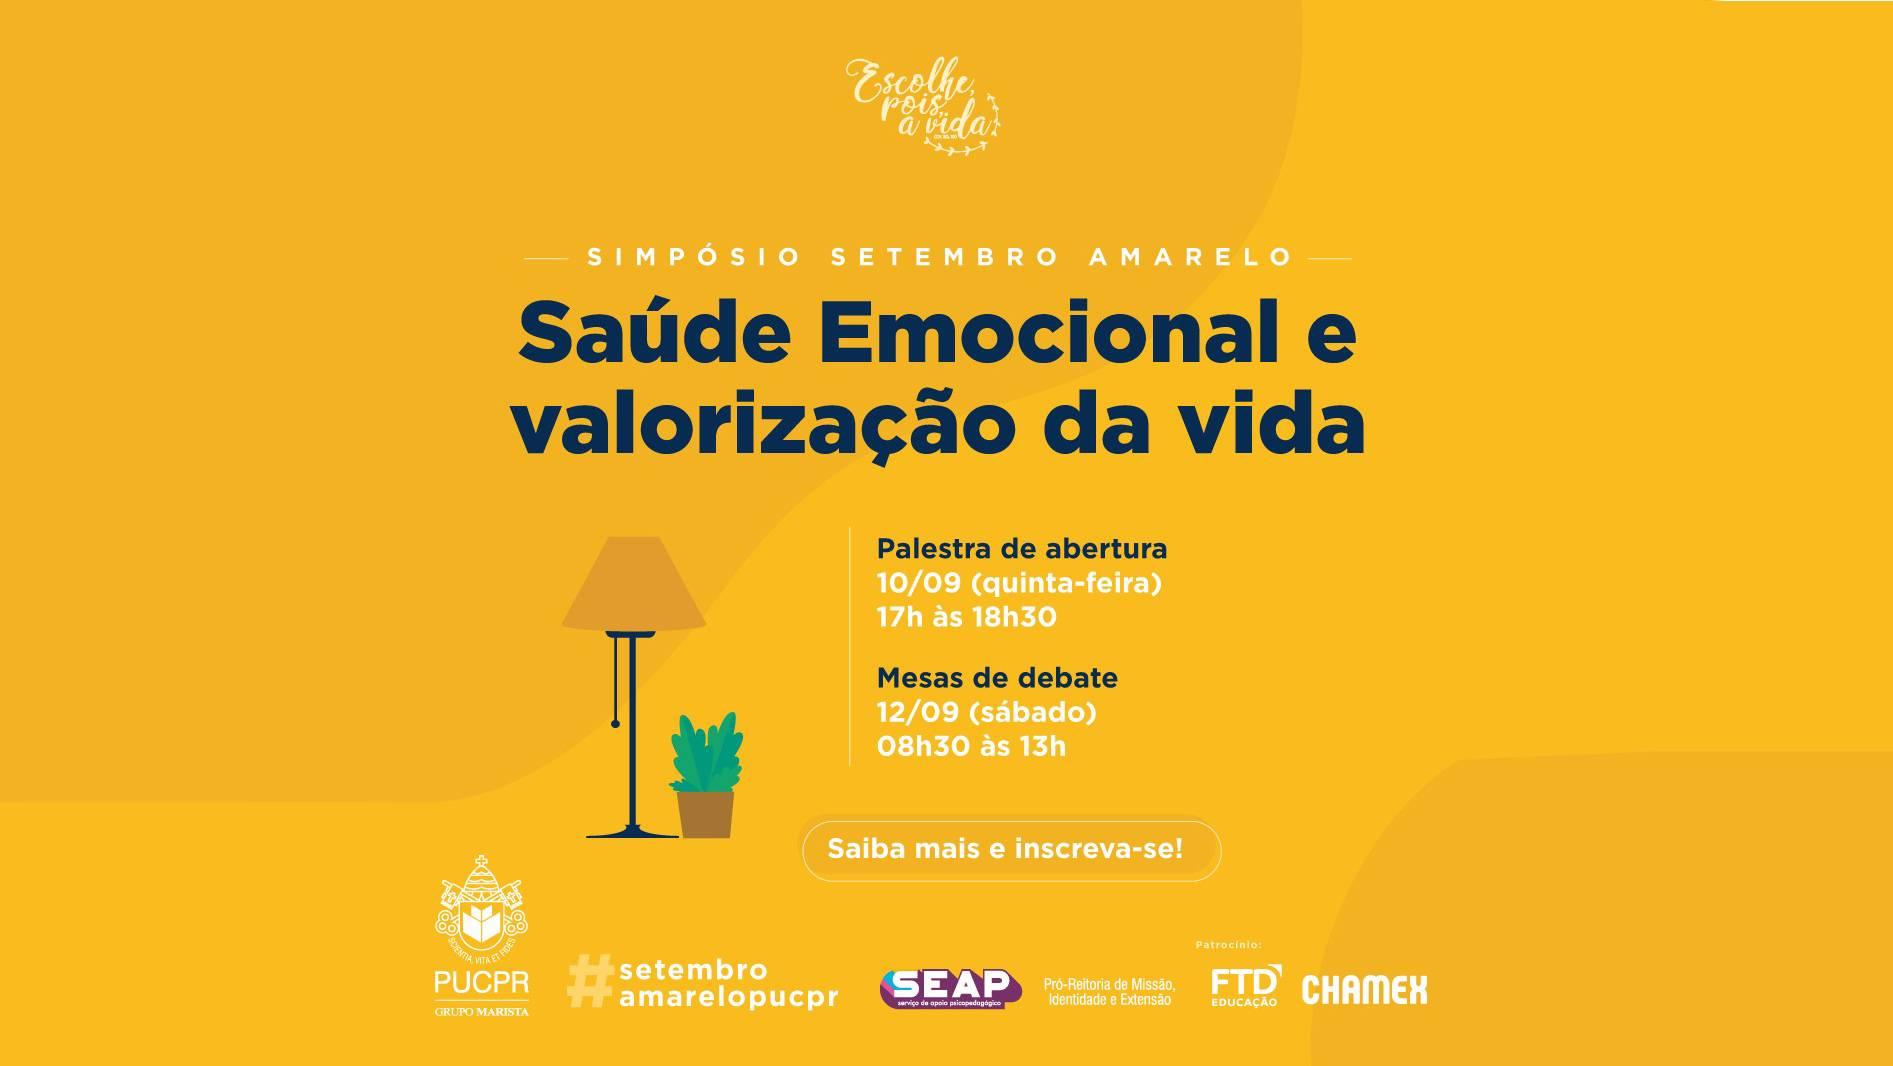 Setembro Amarelo: PUCPR promove evento online para debater saúde mental em tempos de pandemia